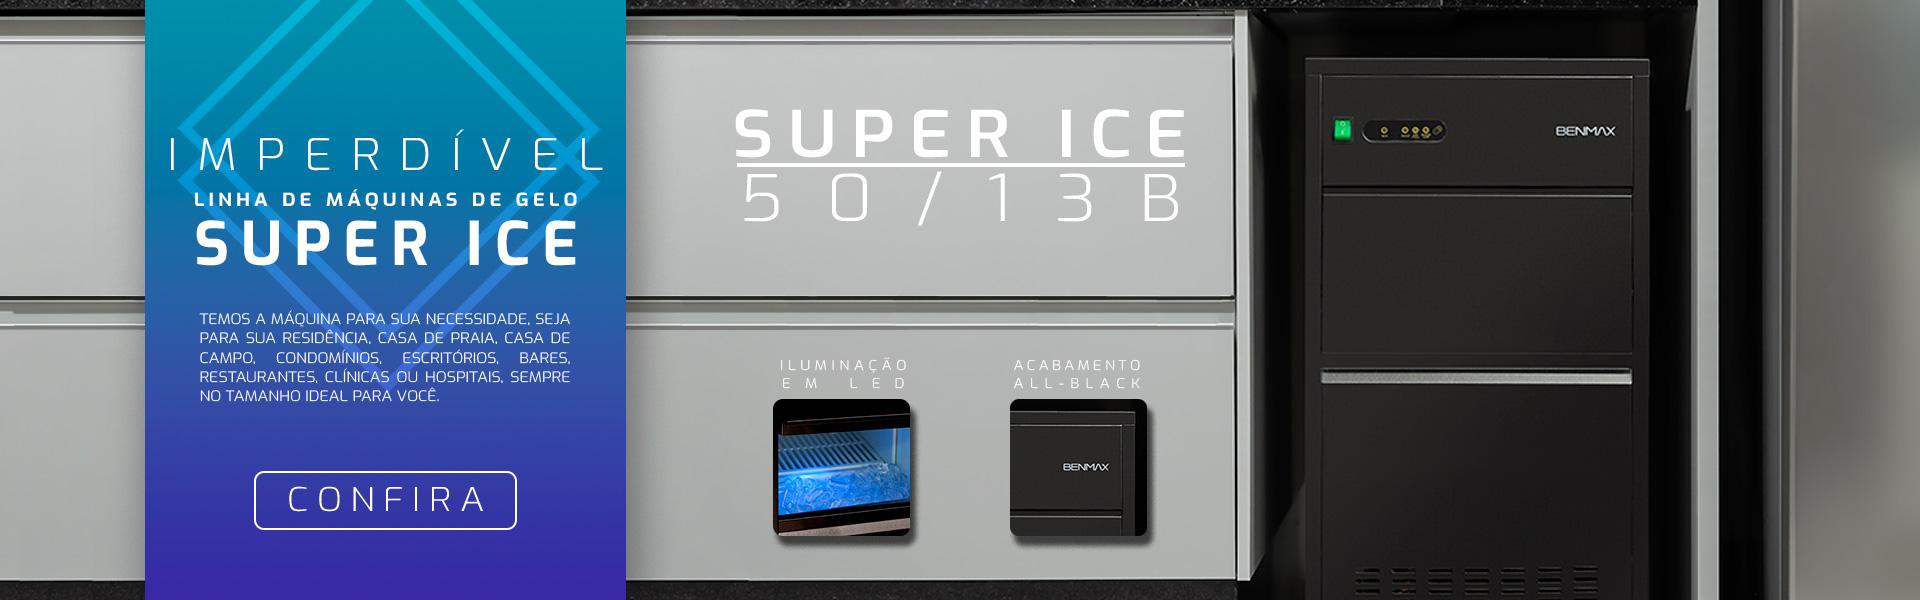 https://www.lojabenmax.com.br/maquinadegelo/maquina-de-gelo-benmax-5013-black-220v